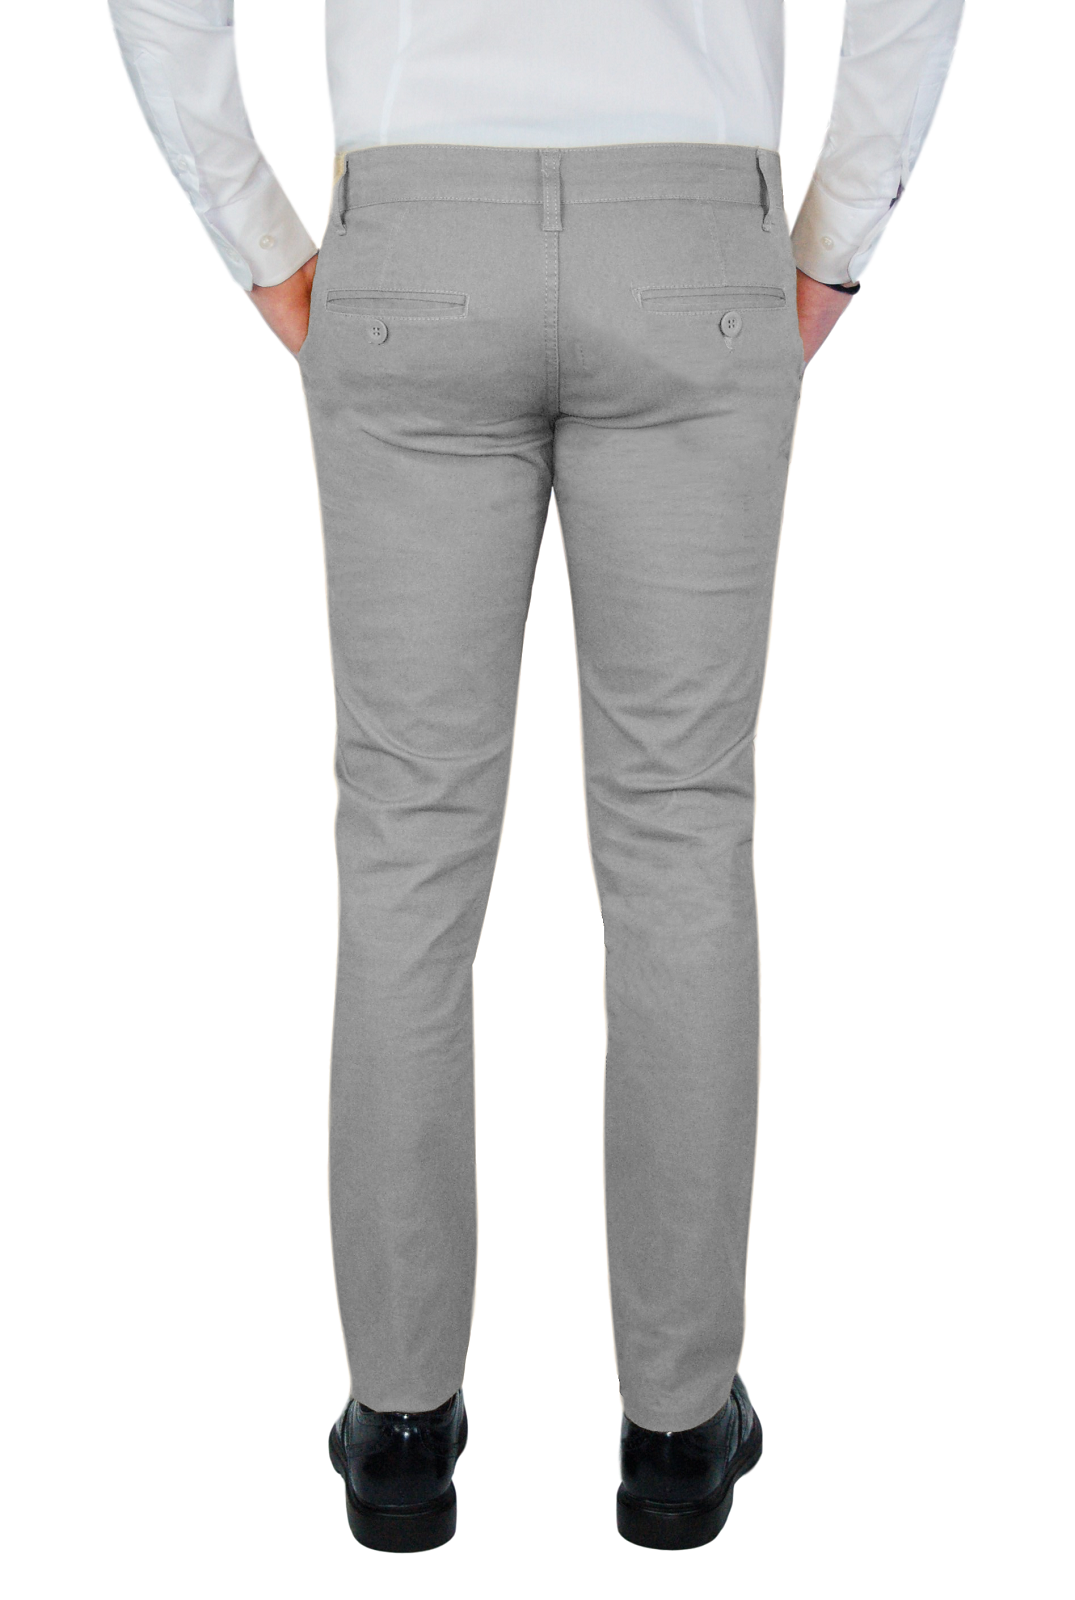 Pantalone-Uomo-Chino-Nero-Bianco-Primaverile-slim-fit-tasca-america-Primavera miniatura 17